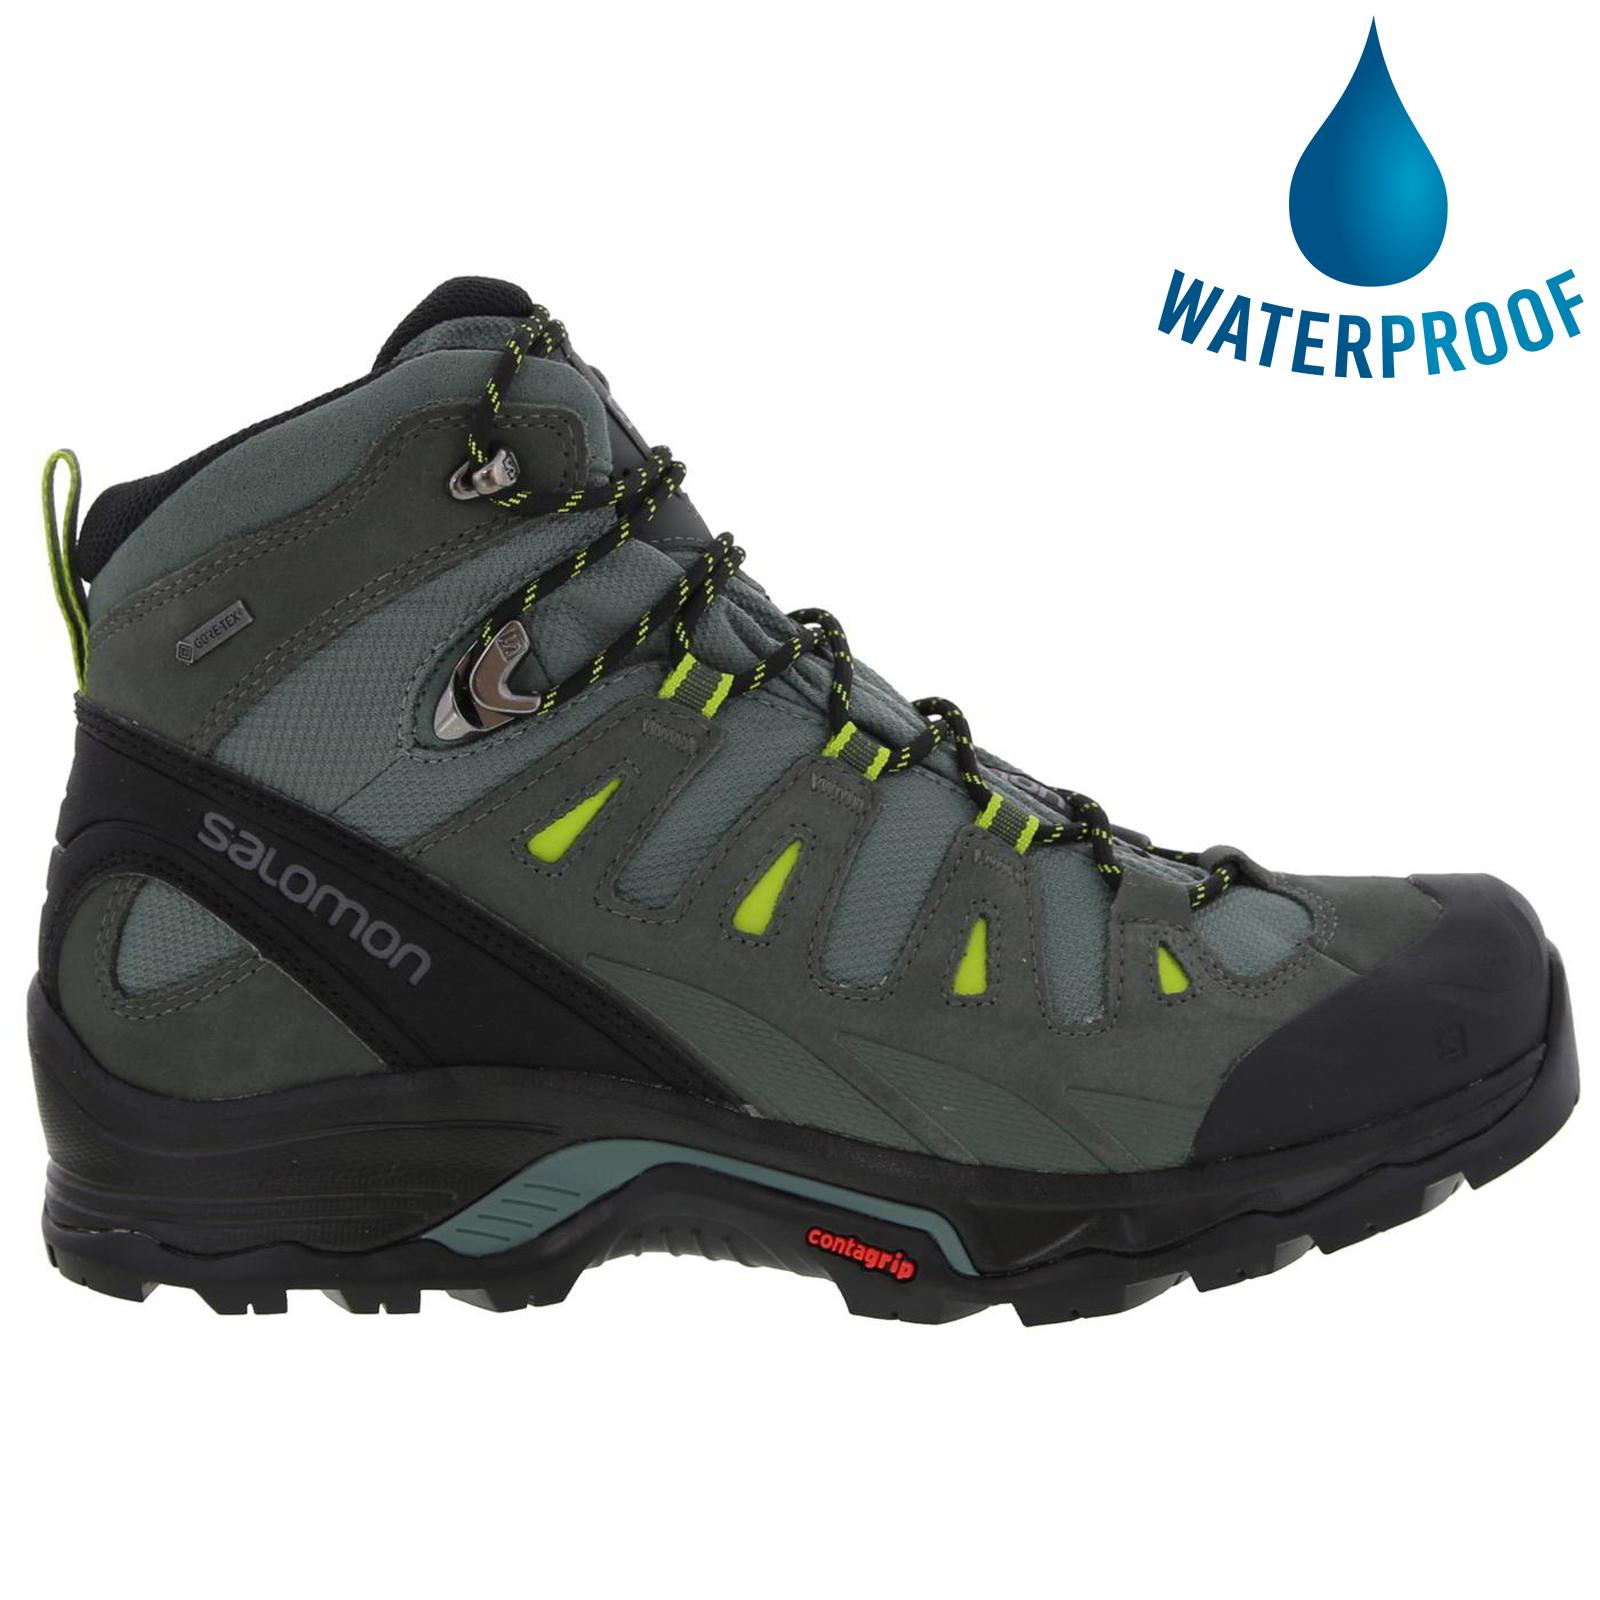 Salomon Mens Quest Prime GTX Waterproof Walking Hiking Boots - Balsam Green